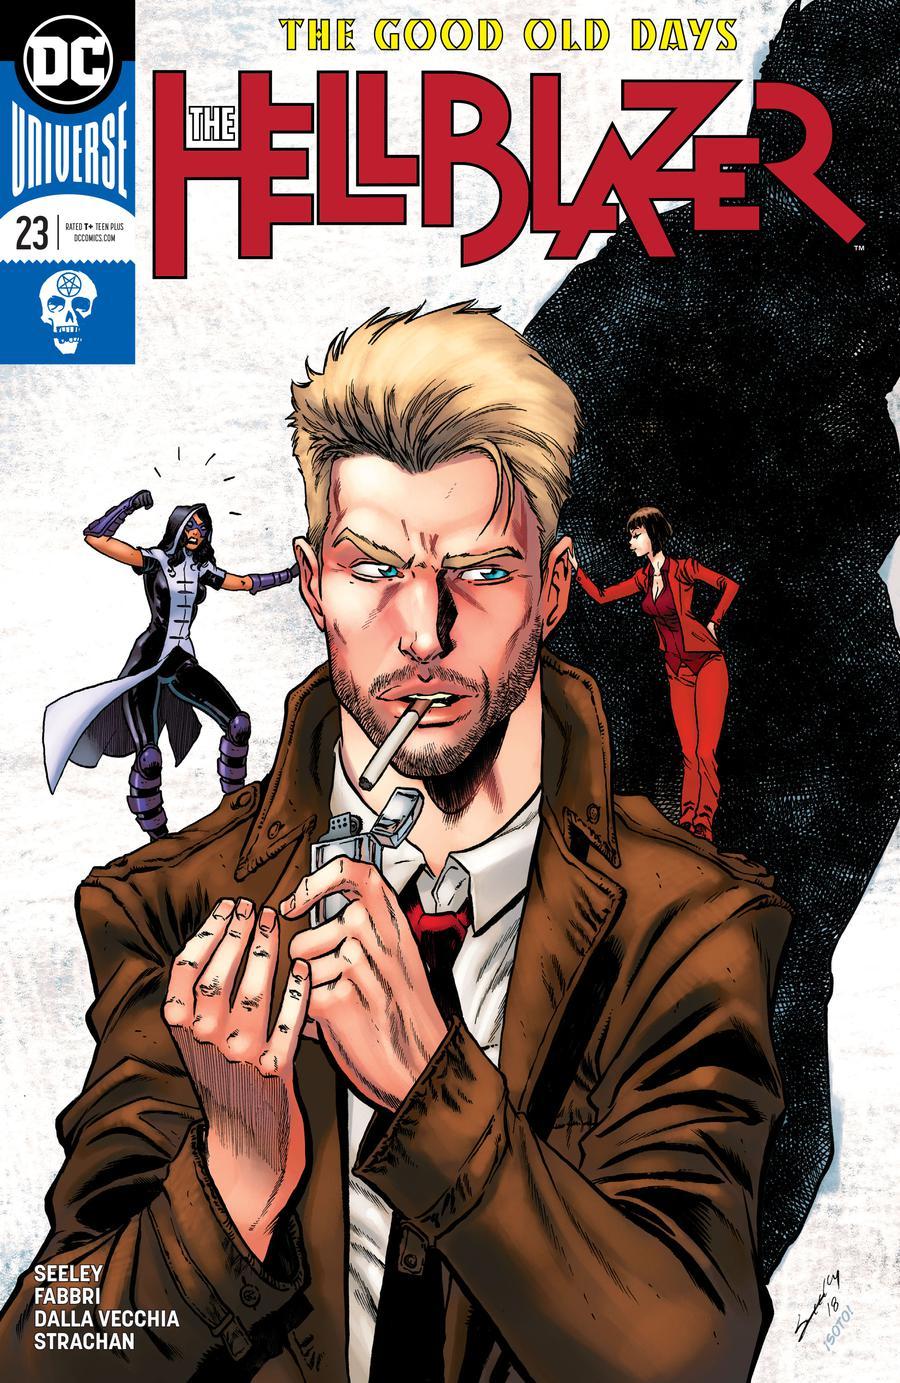 Hellblazer Vol 2 #23 Cover A Regular Tim Seeley Cover